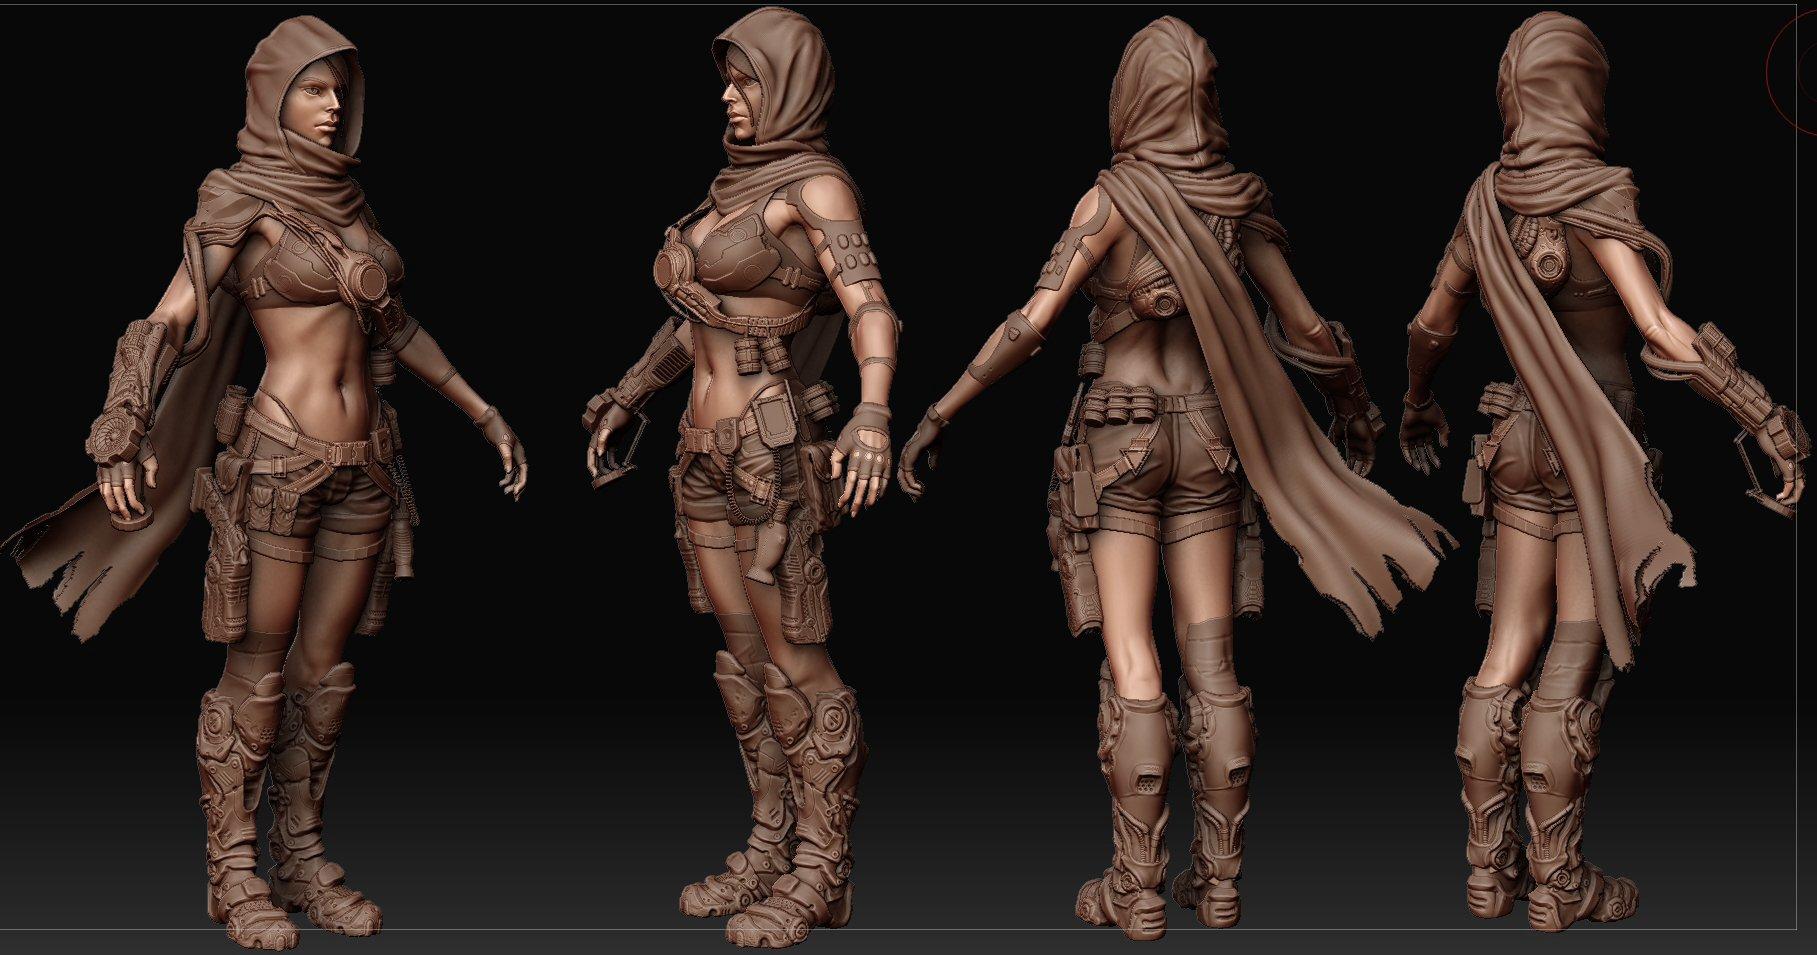 Lara croft troll nude clip